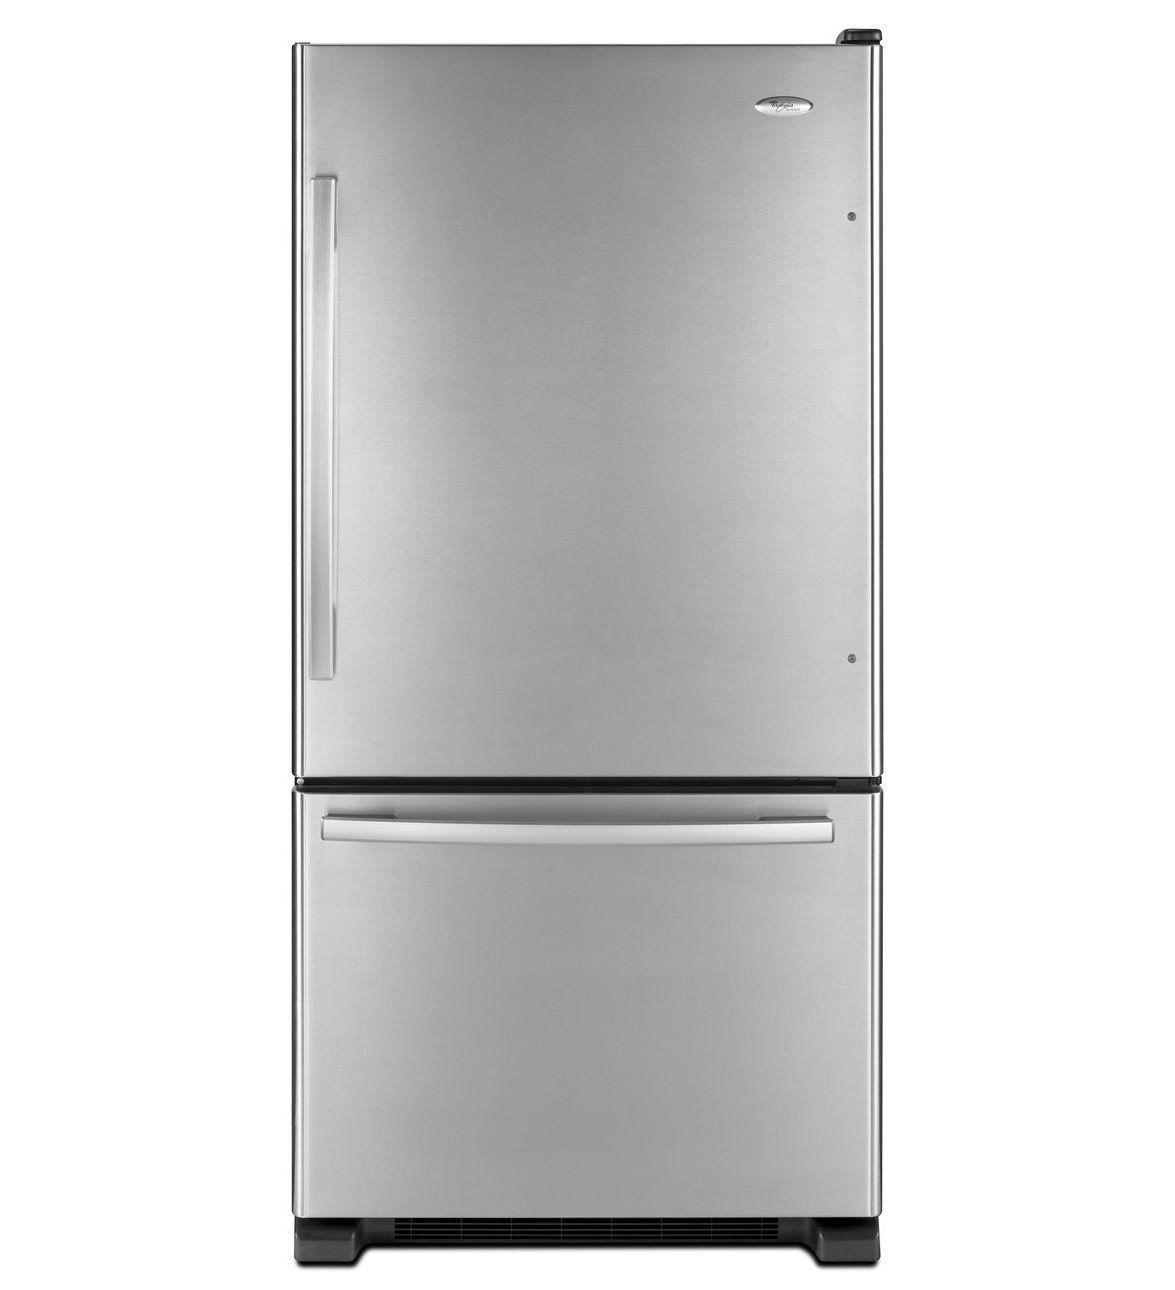 Kitchenaid Krbr102ess Bottom Mount Refrigerator 33 Width